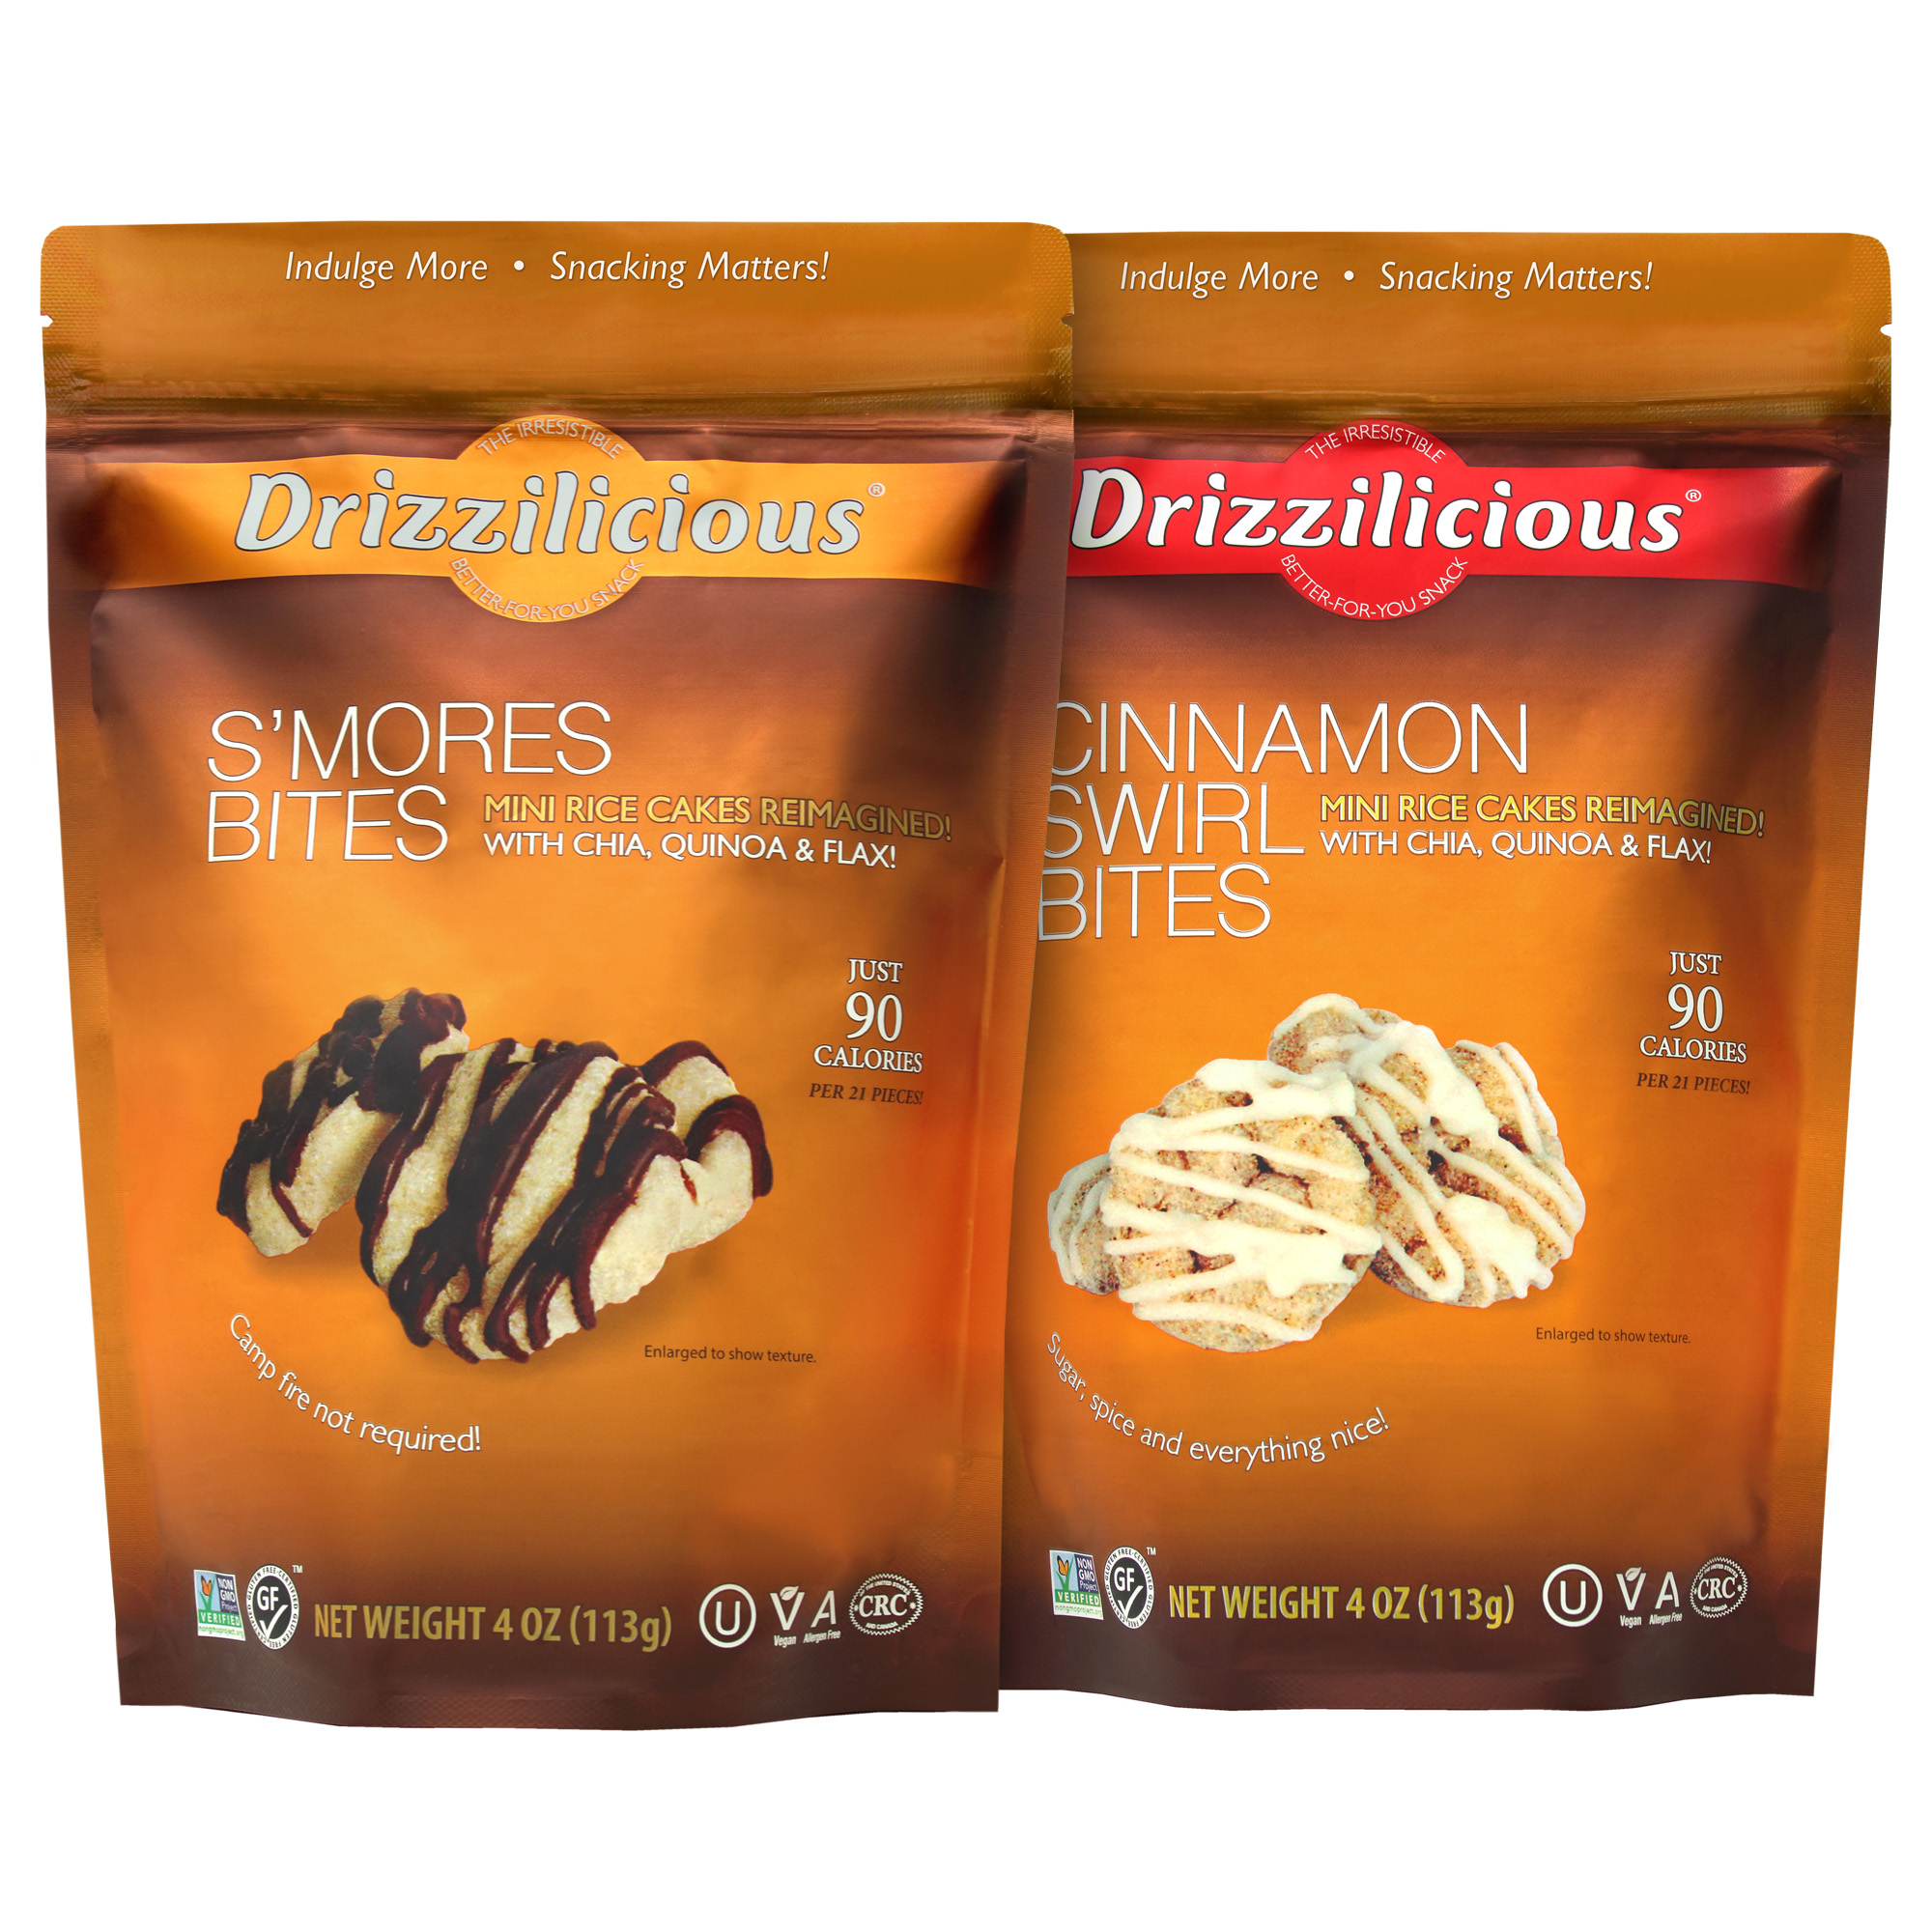 Drizzilicious Mini Rice Cakes and Popcorn